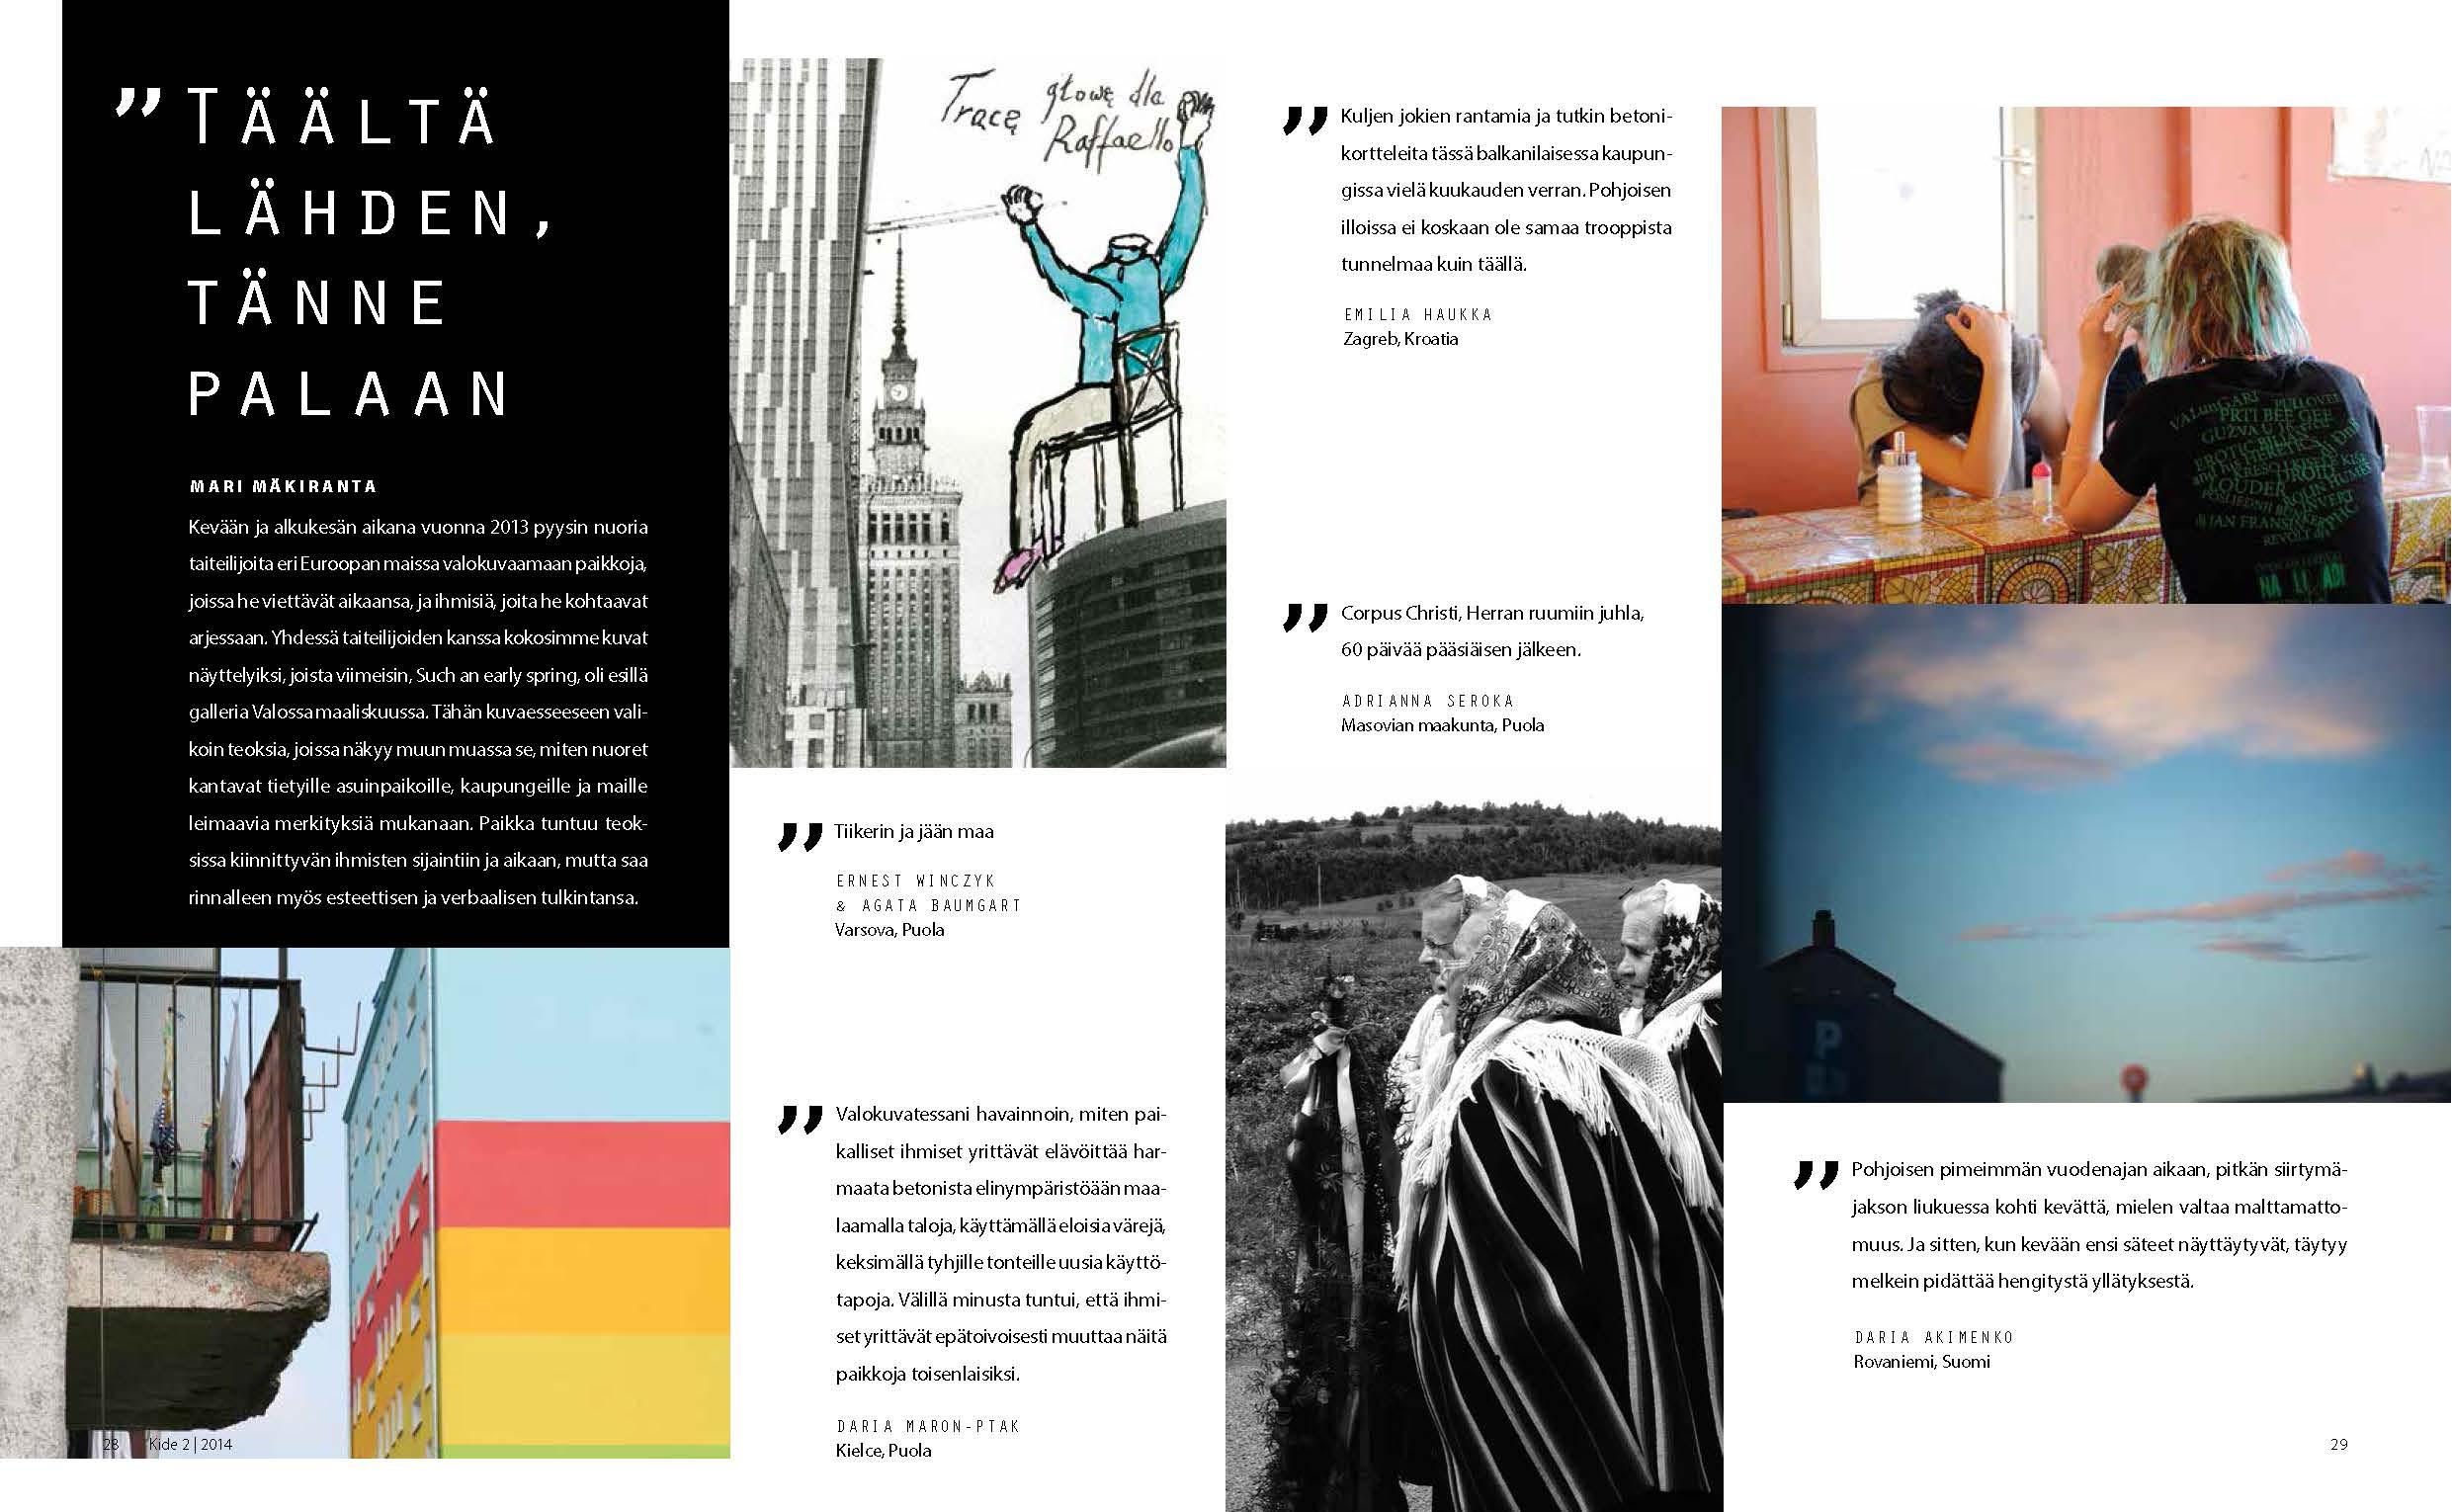 002 Essay Example Kide2 2014 Shocking Visual Response Examples Literacy Arts Full